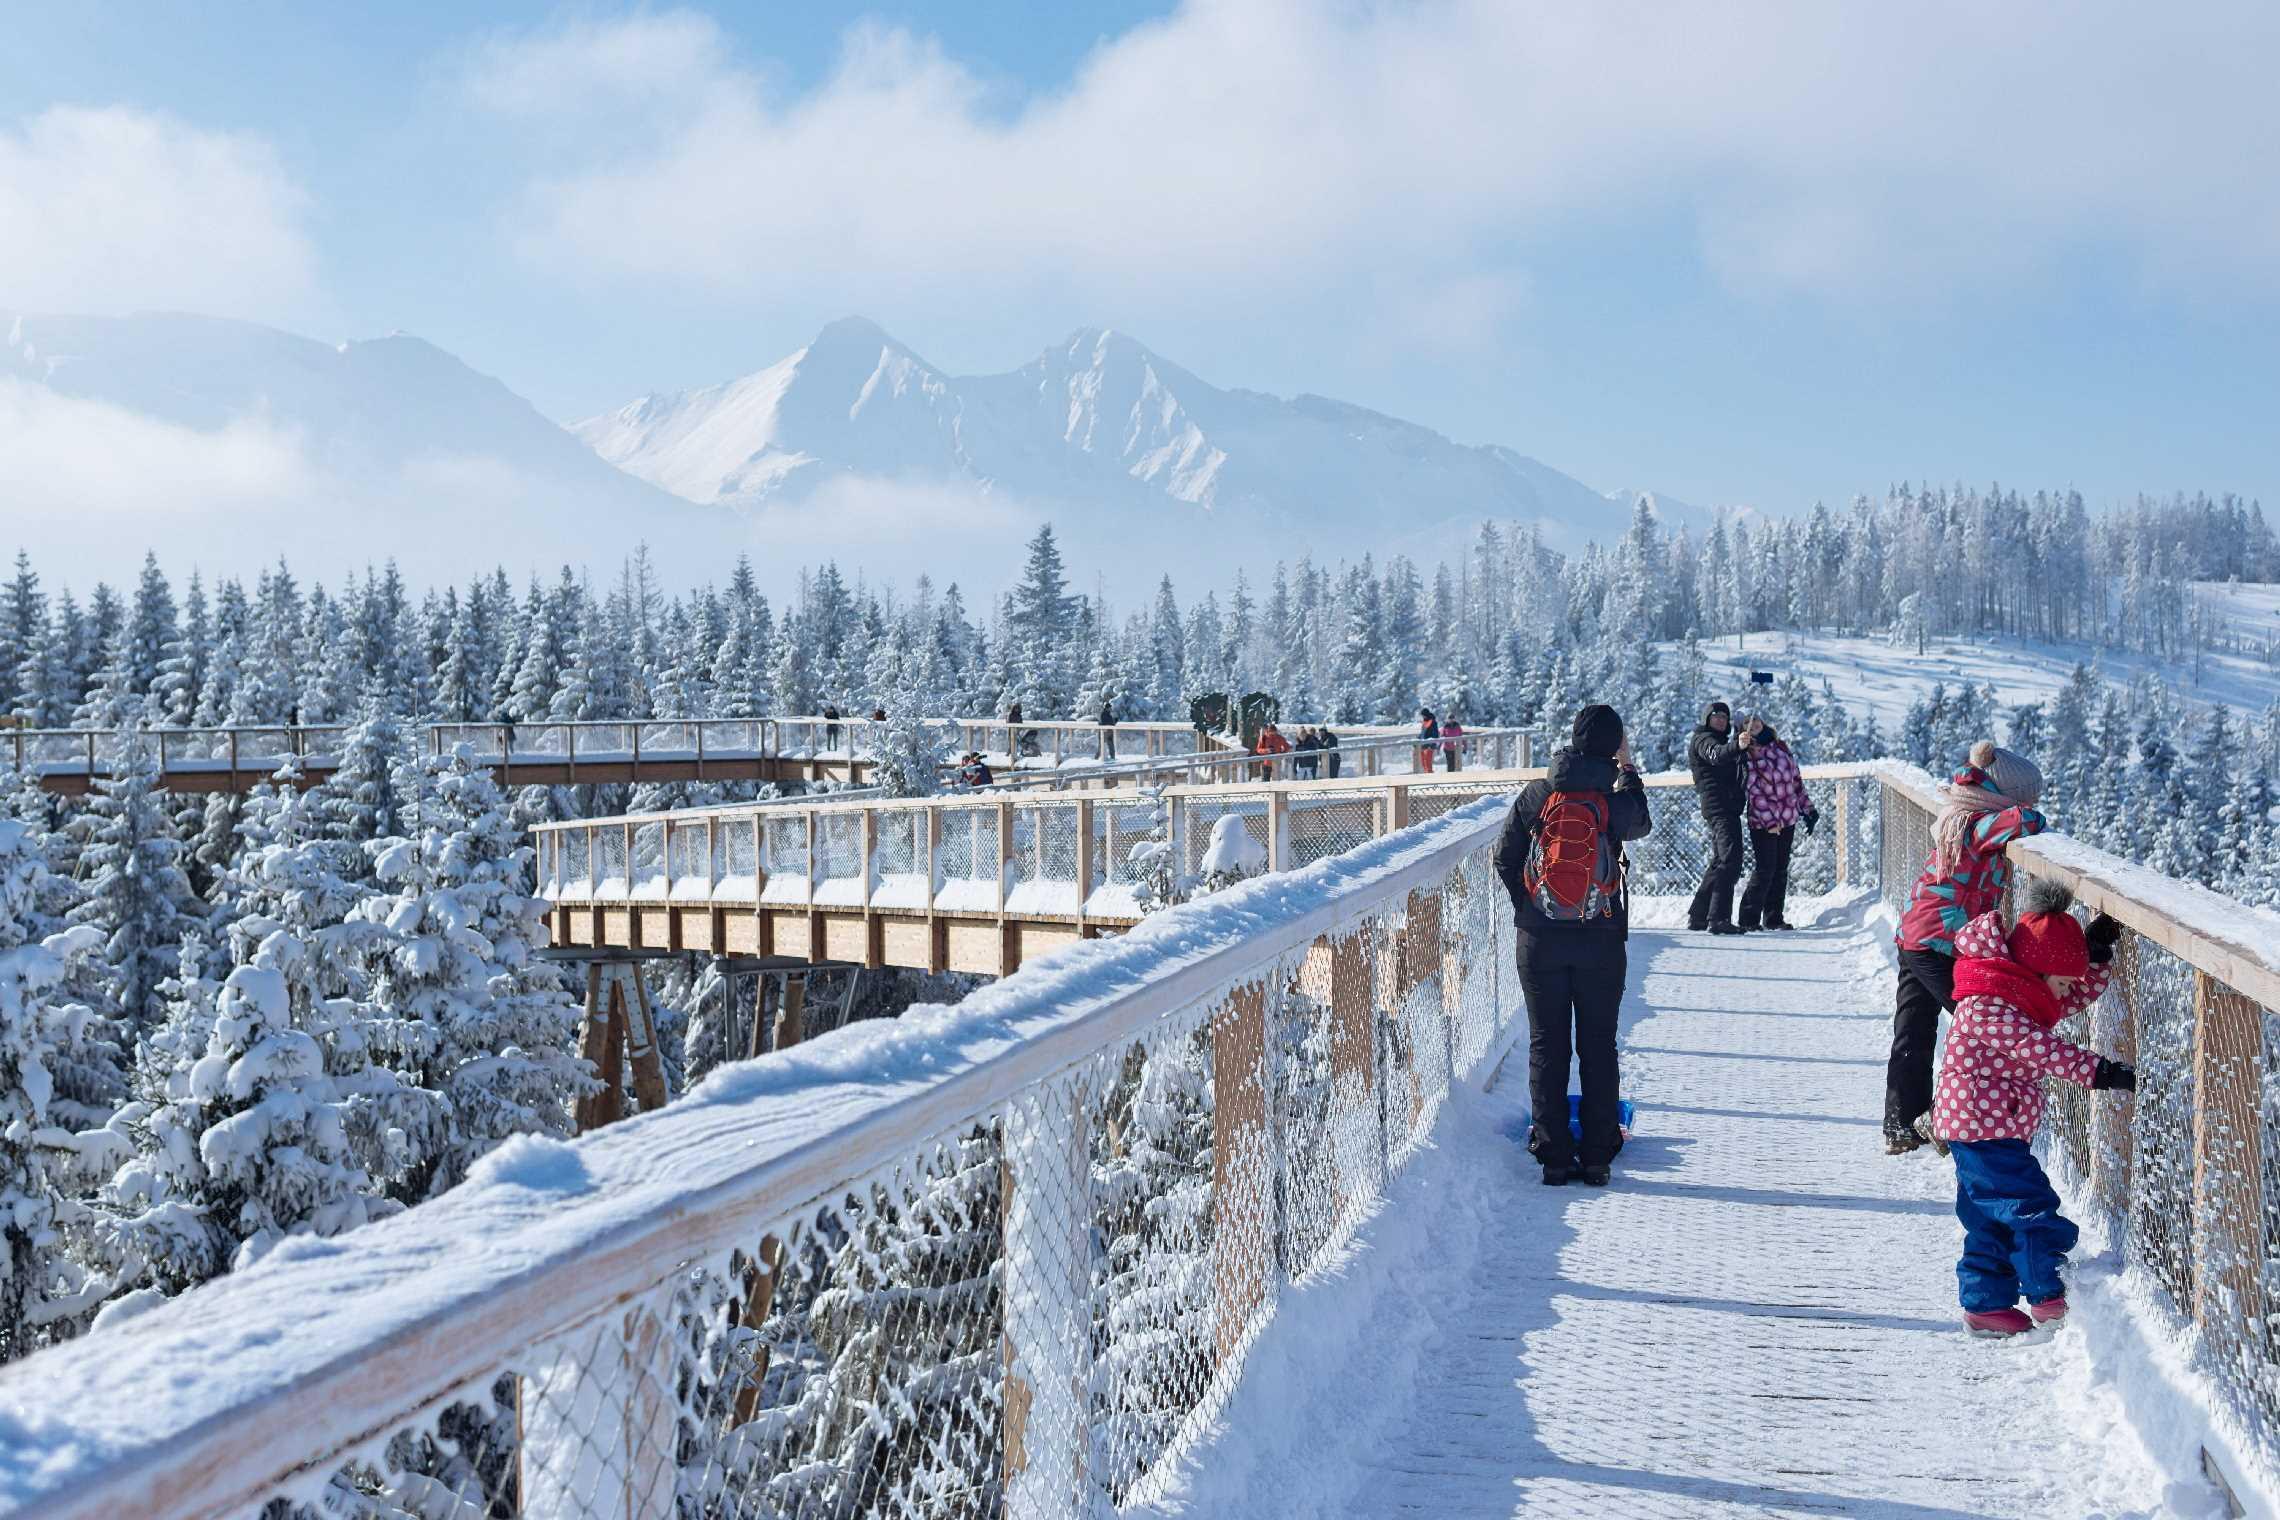 Treetop walk Bachledka | Discover the Tatras from the treetops